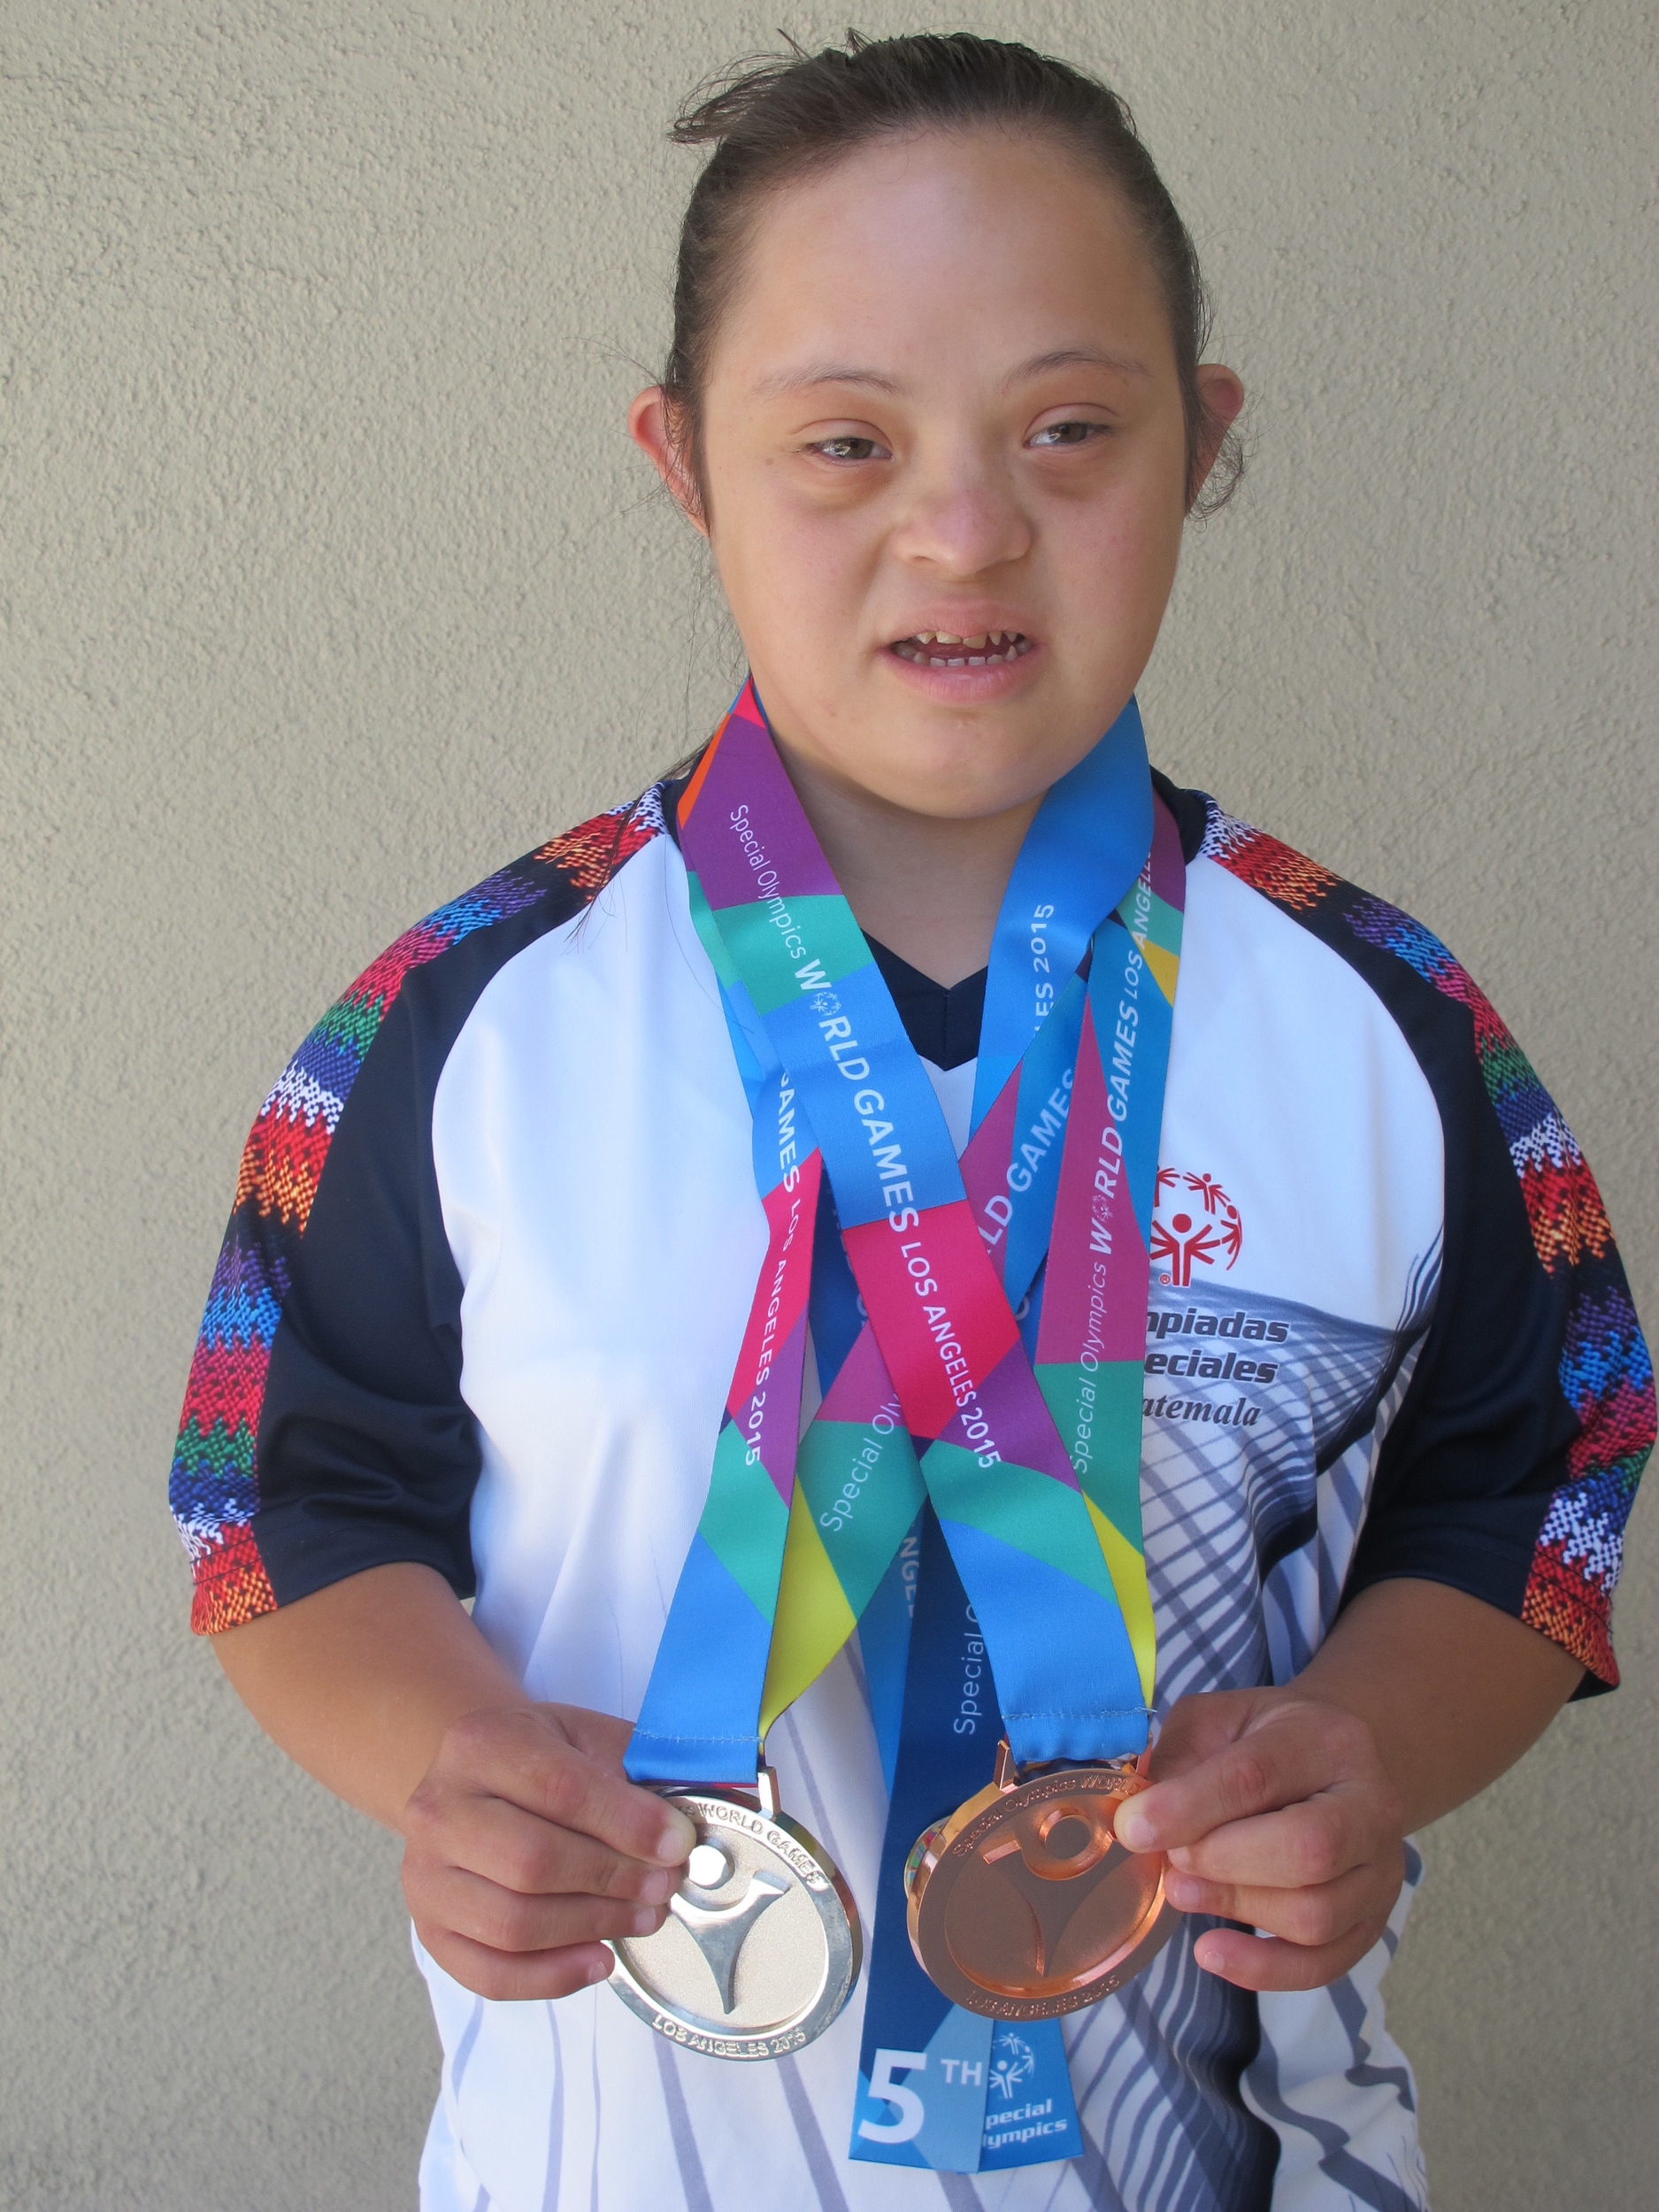 Astrid Barahona Equitación Bronce  en English Equitation y Plata Team Relay con Bulgaria.JPG